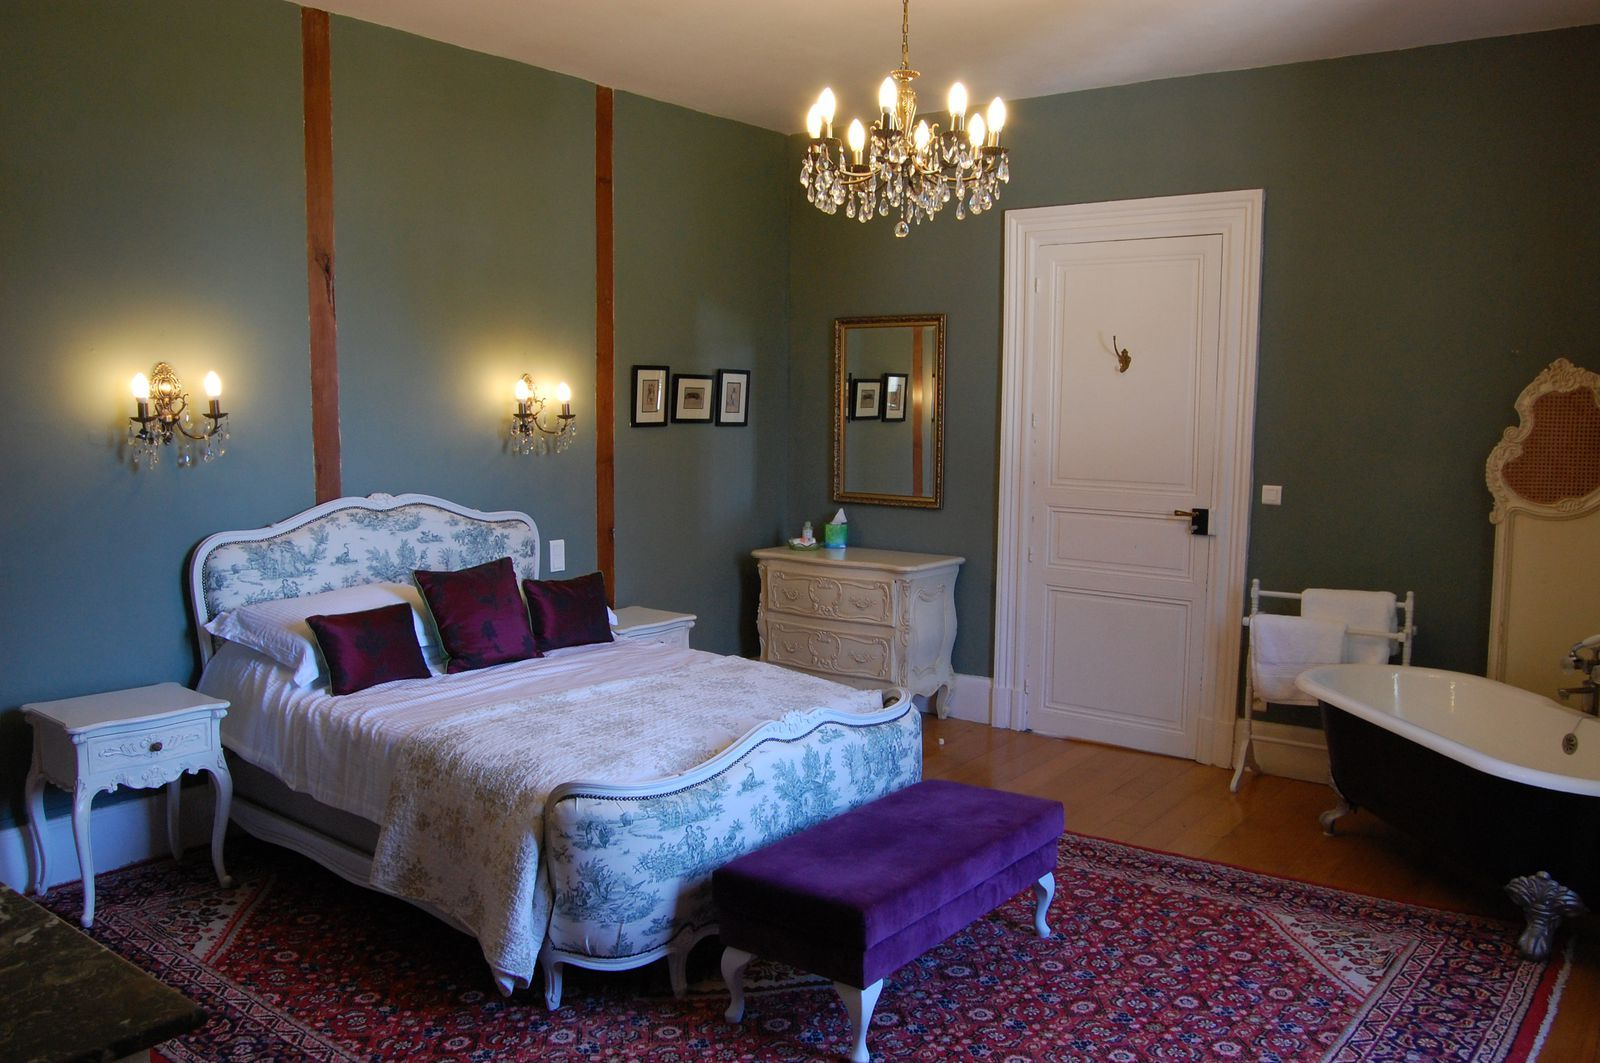 Escape to the Chateau DIY inside Chateau Caillac, a